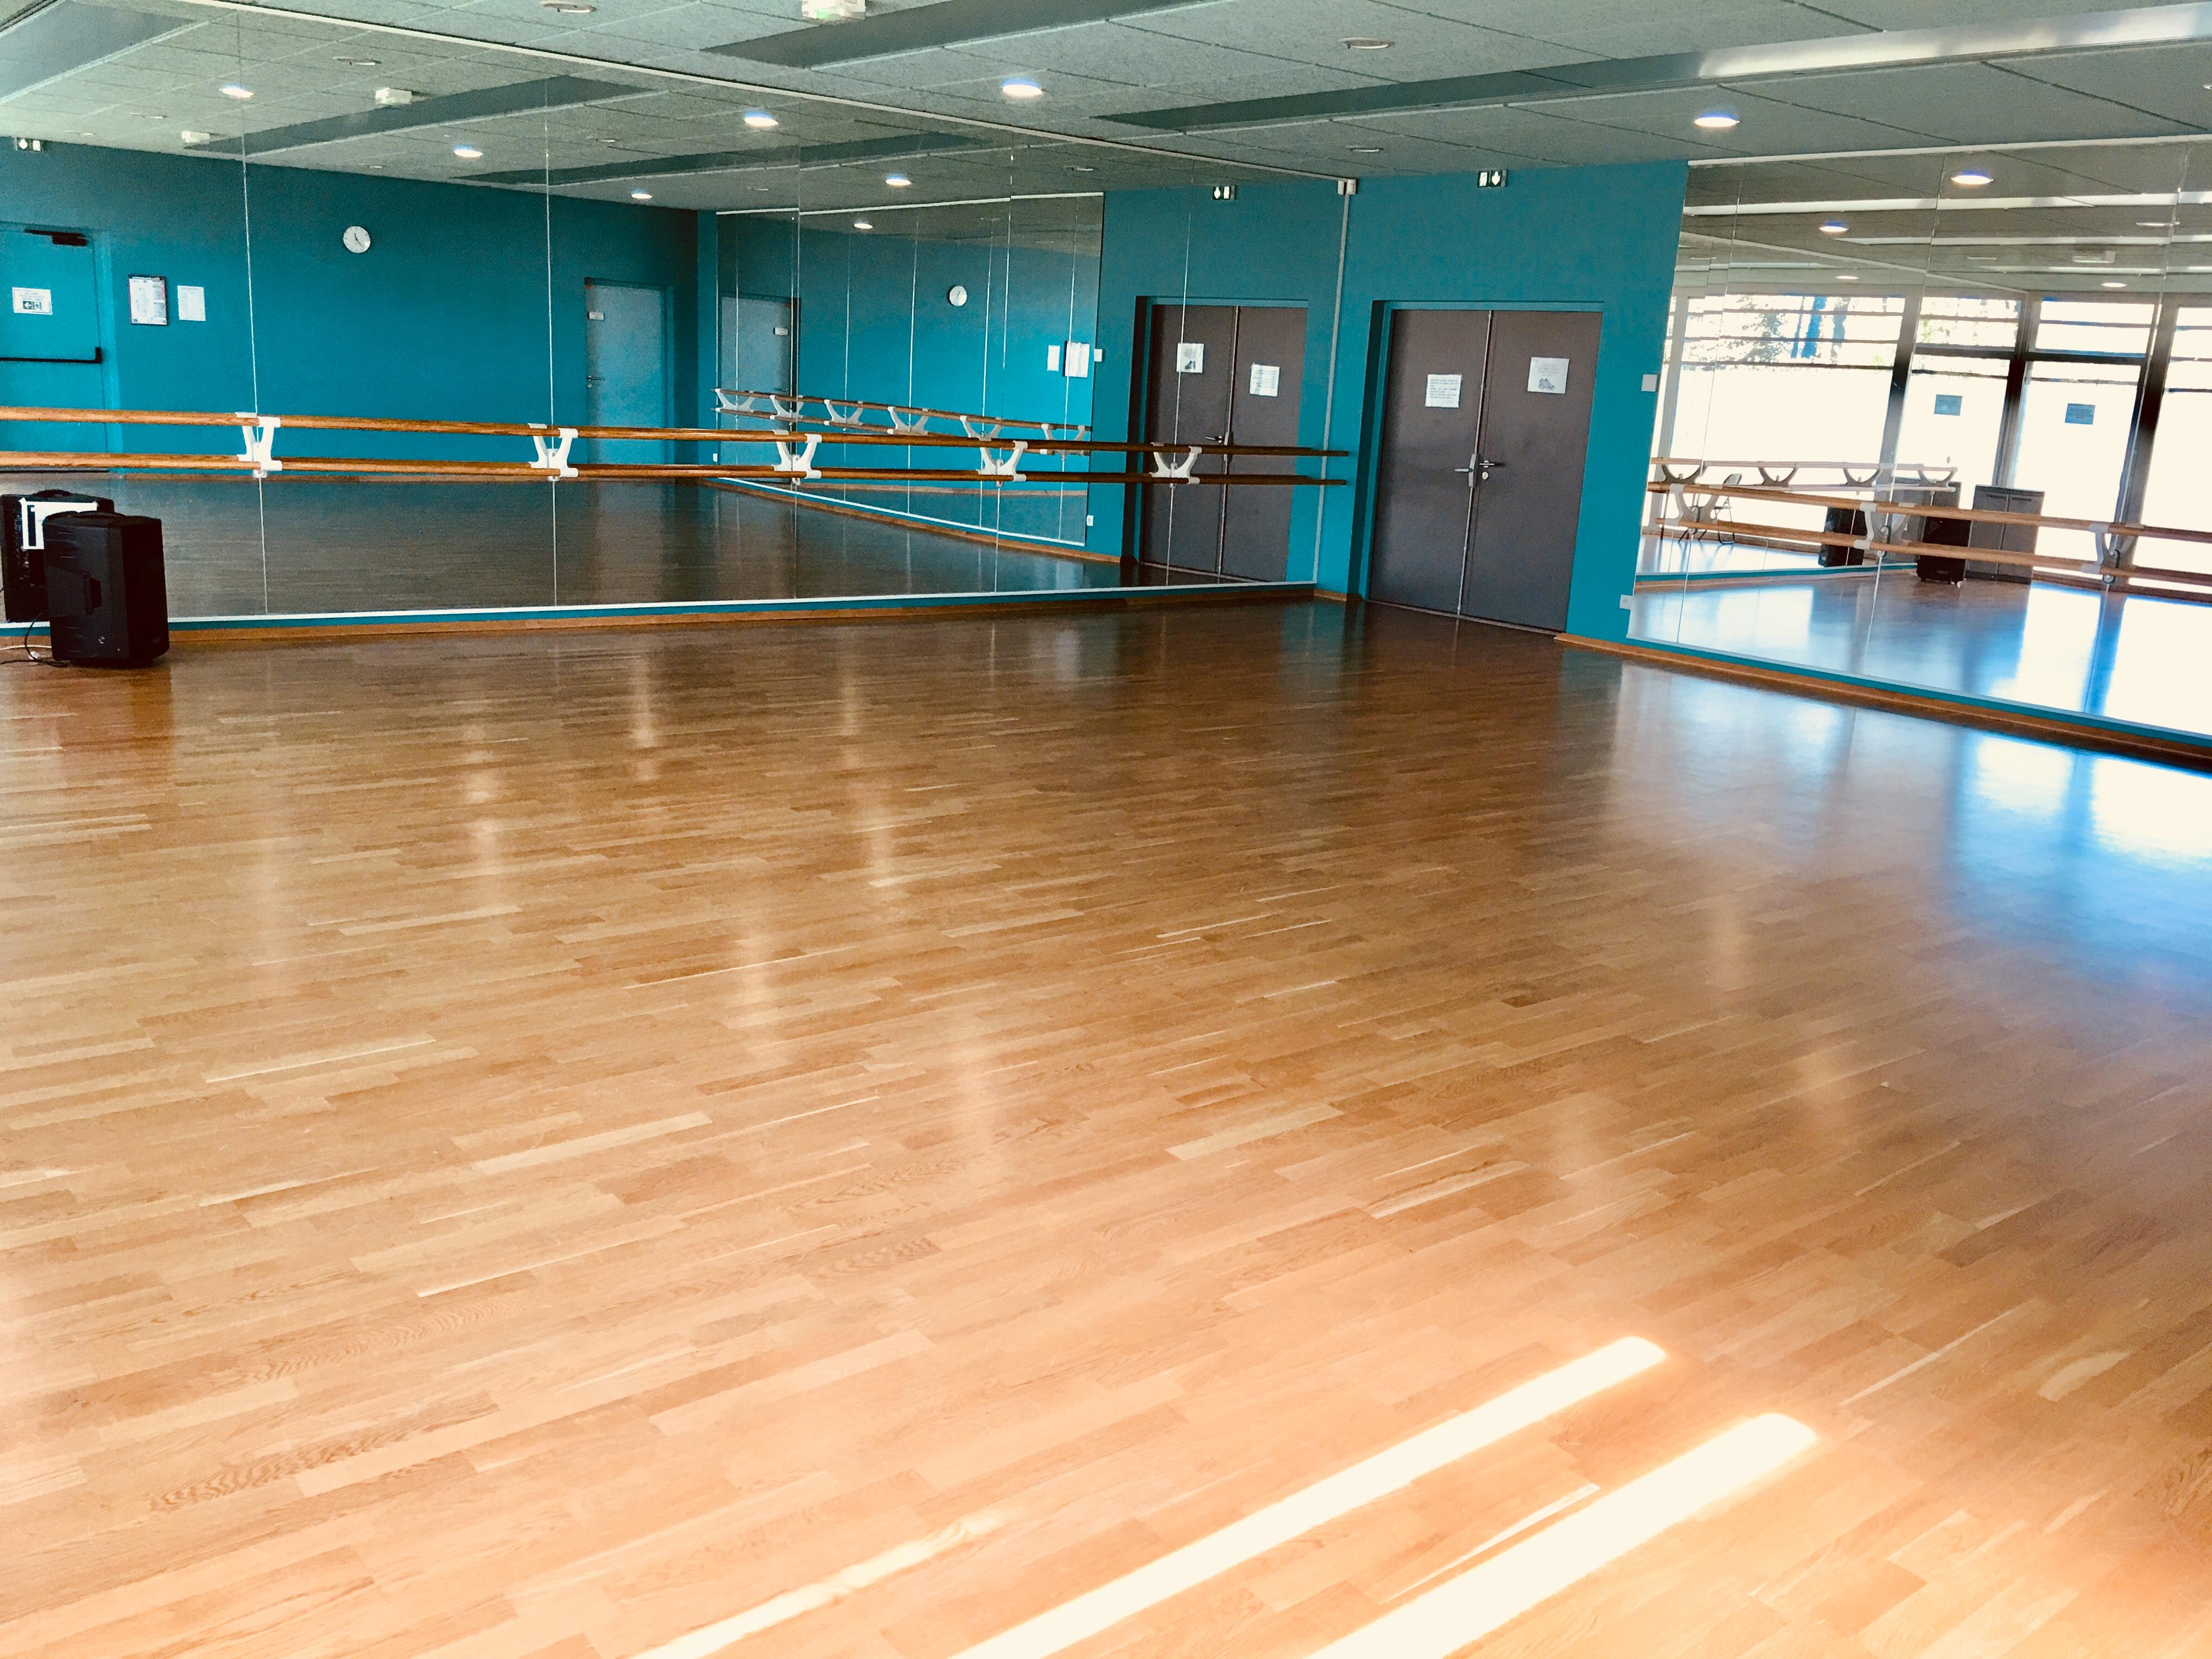 Salle de danse 1